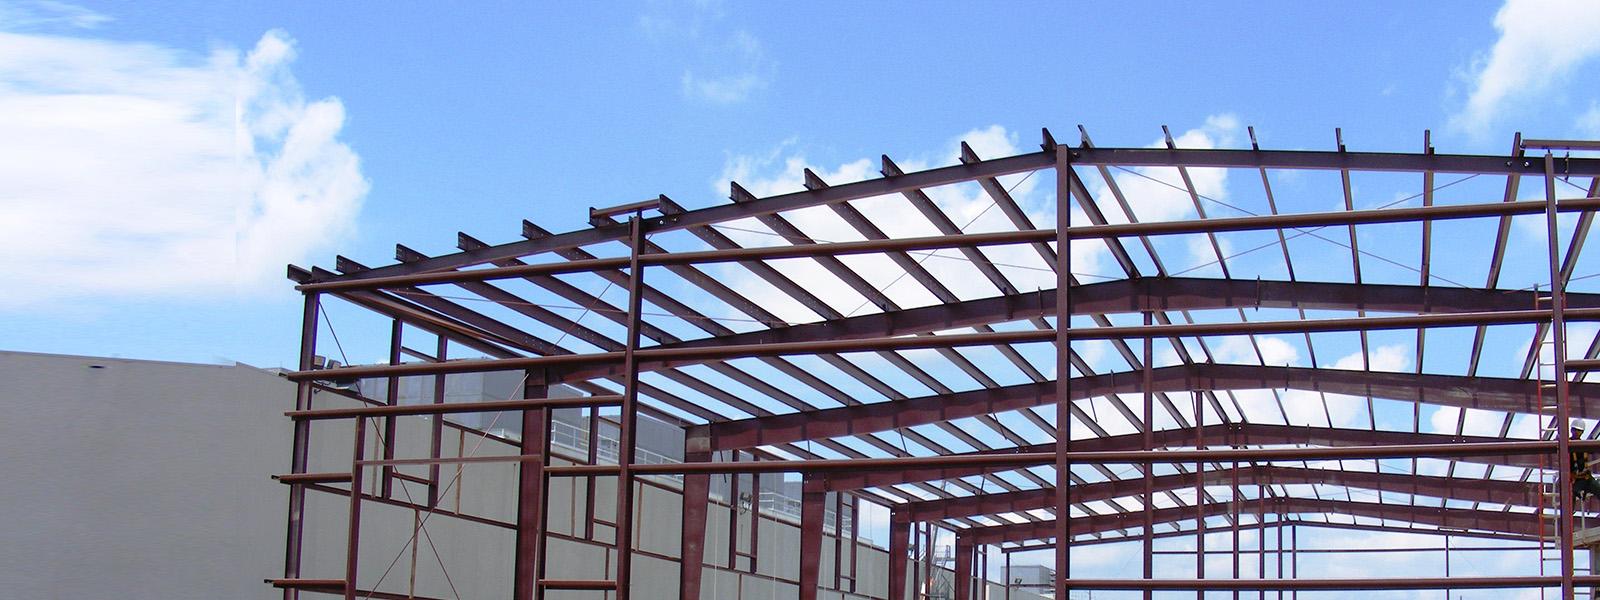 Peb Manufacturers, Peb Structure Manufacturing Companies